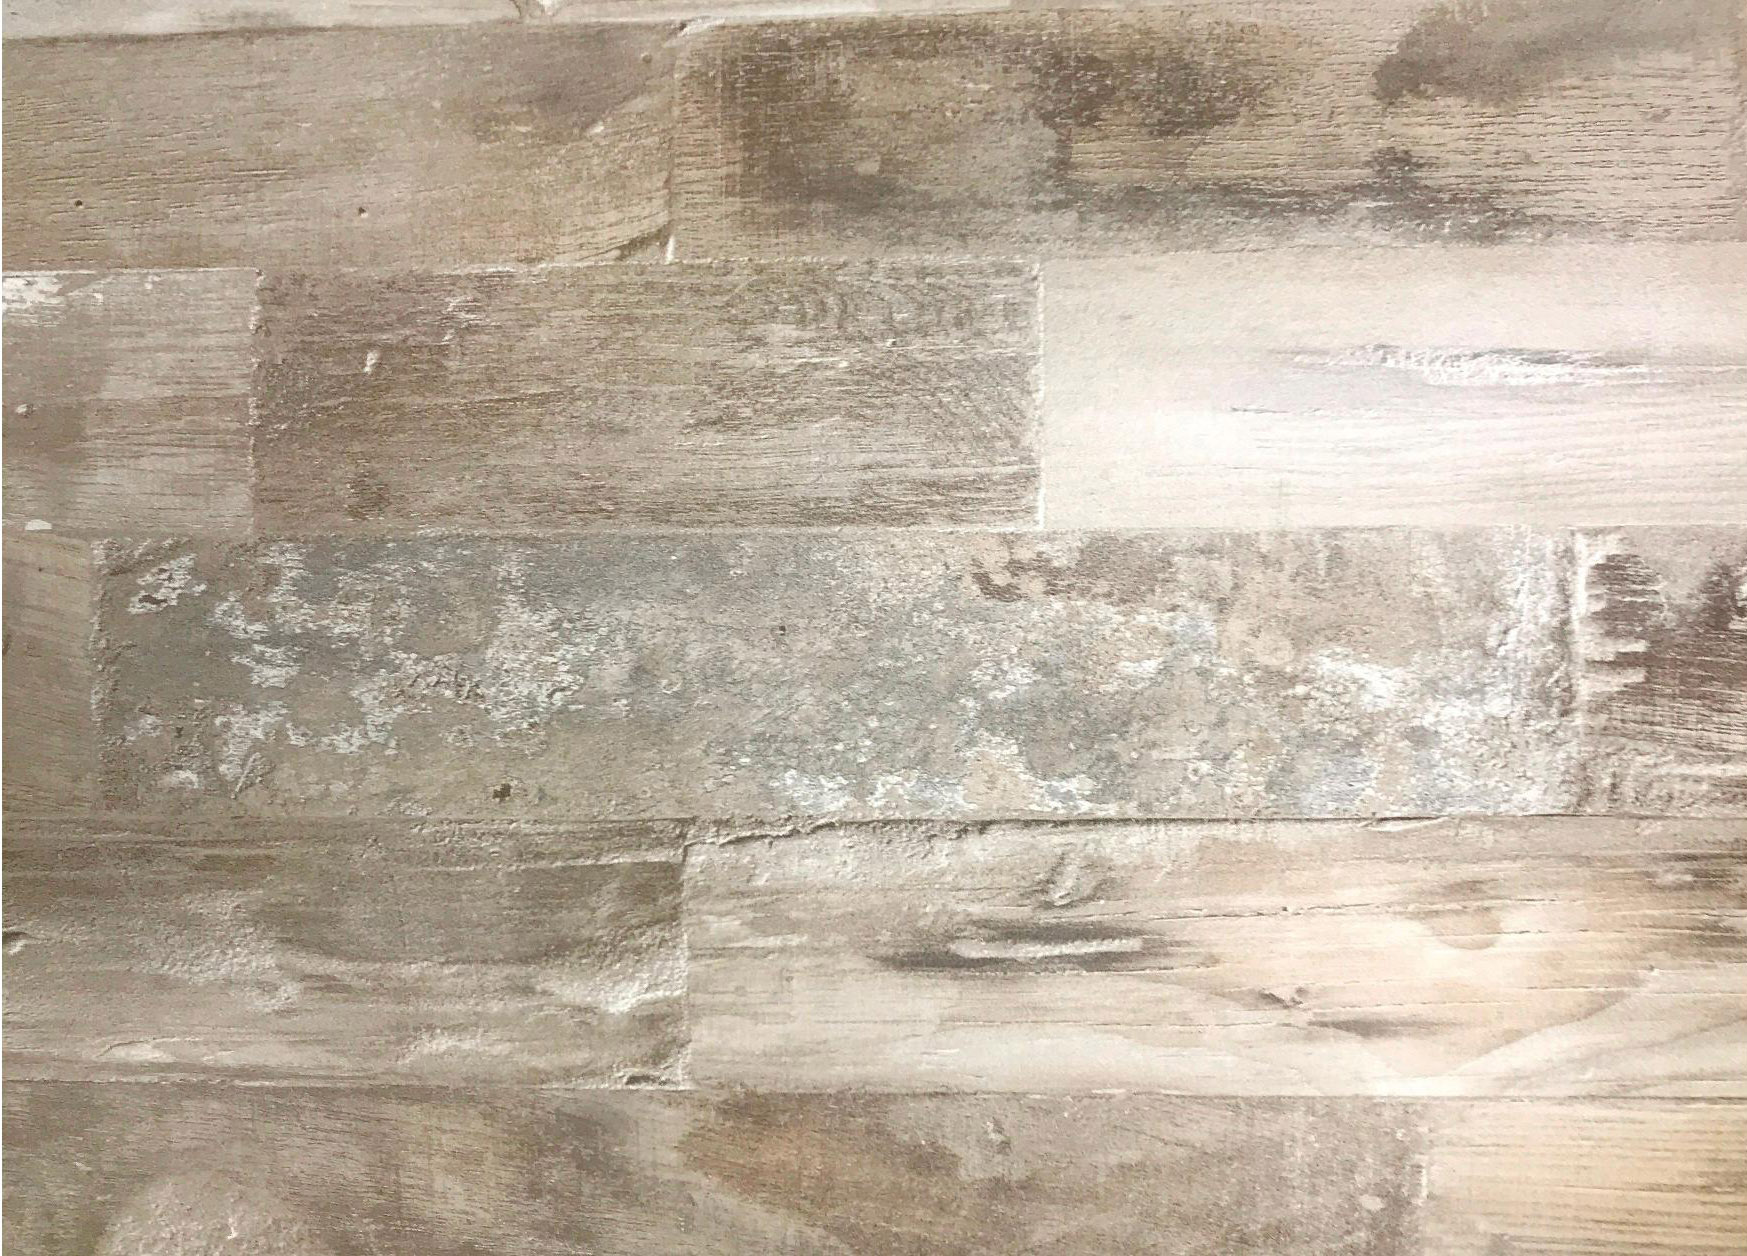 Стеновая панель № 39Г/ Канадская хижина 6 мм